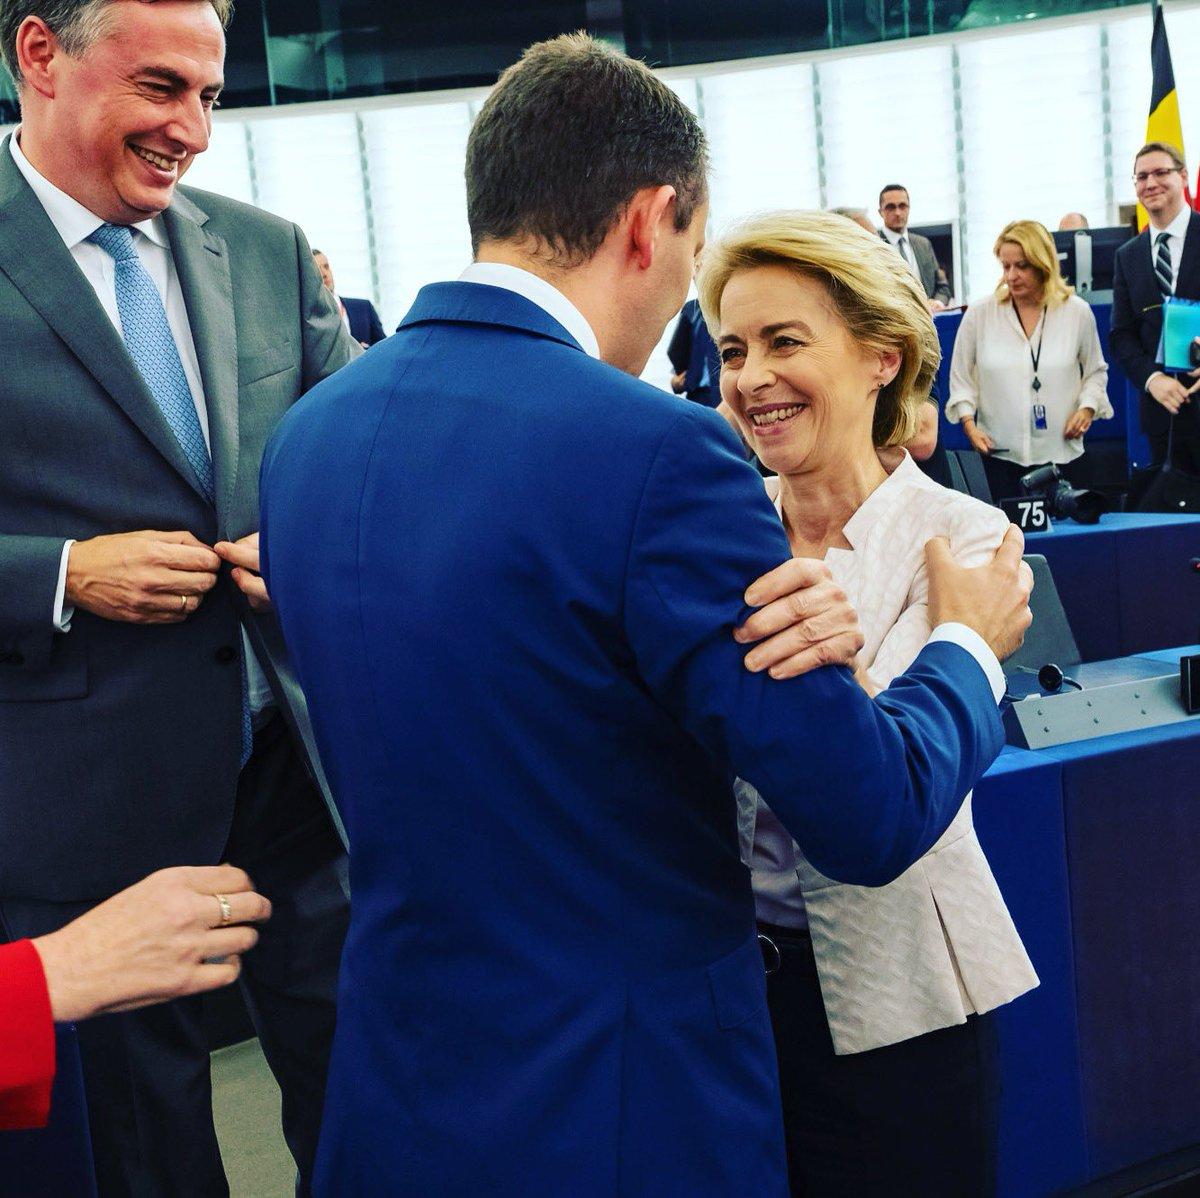 Congratulations, Ursula von der Leyen! Your election is good news for #europe and it is an inspiration for all the women. #womenempowerment @vonderleyen @epp @eppgroup